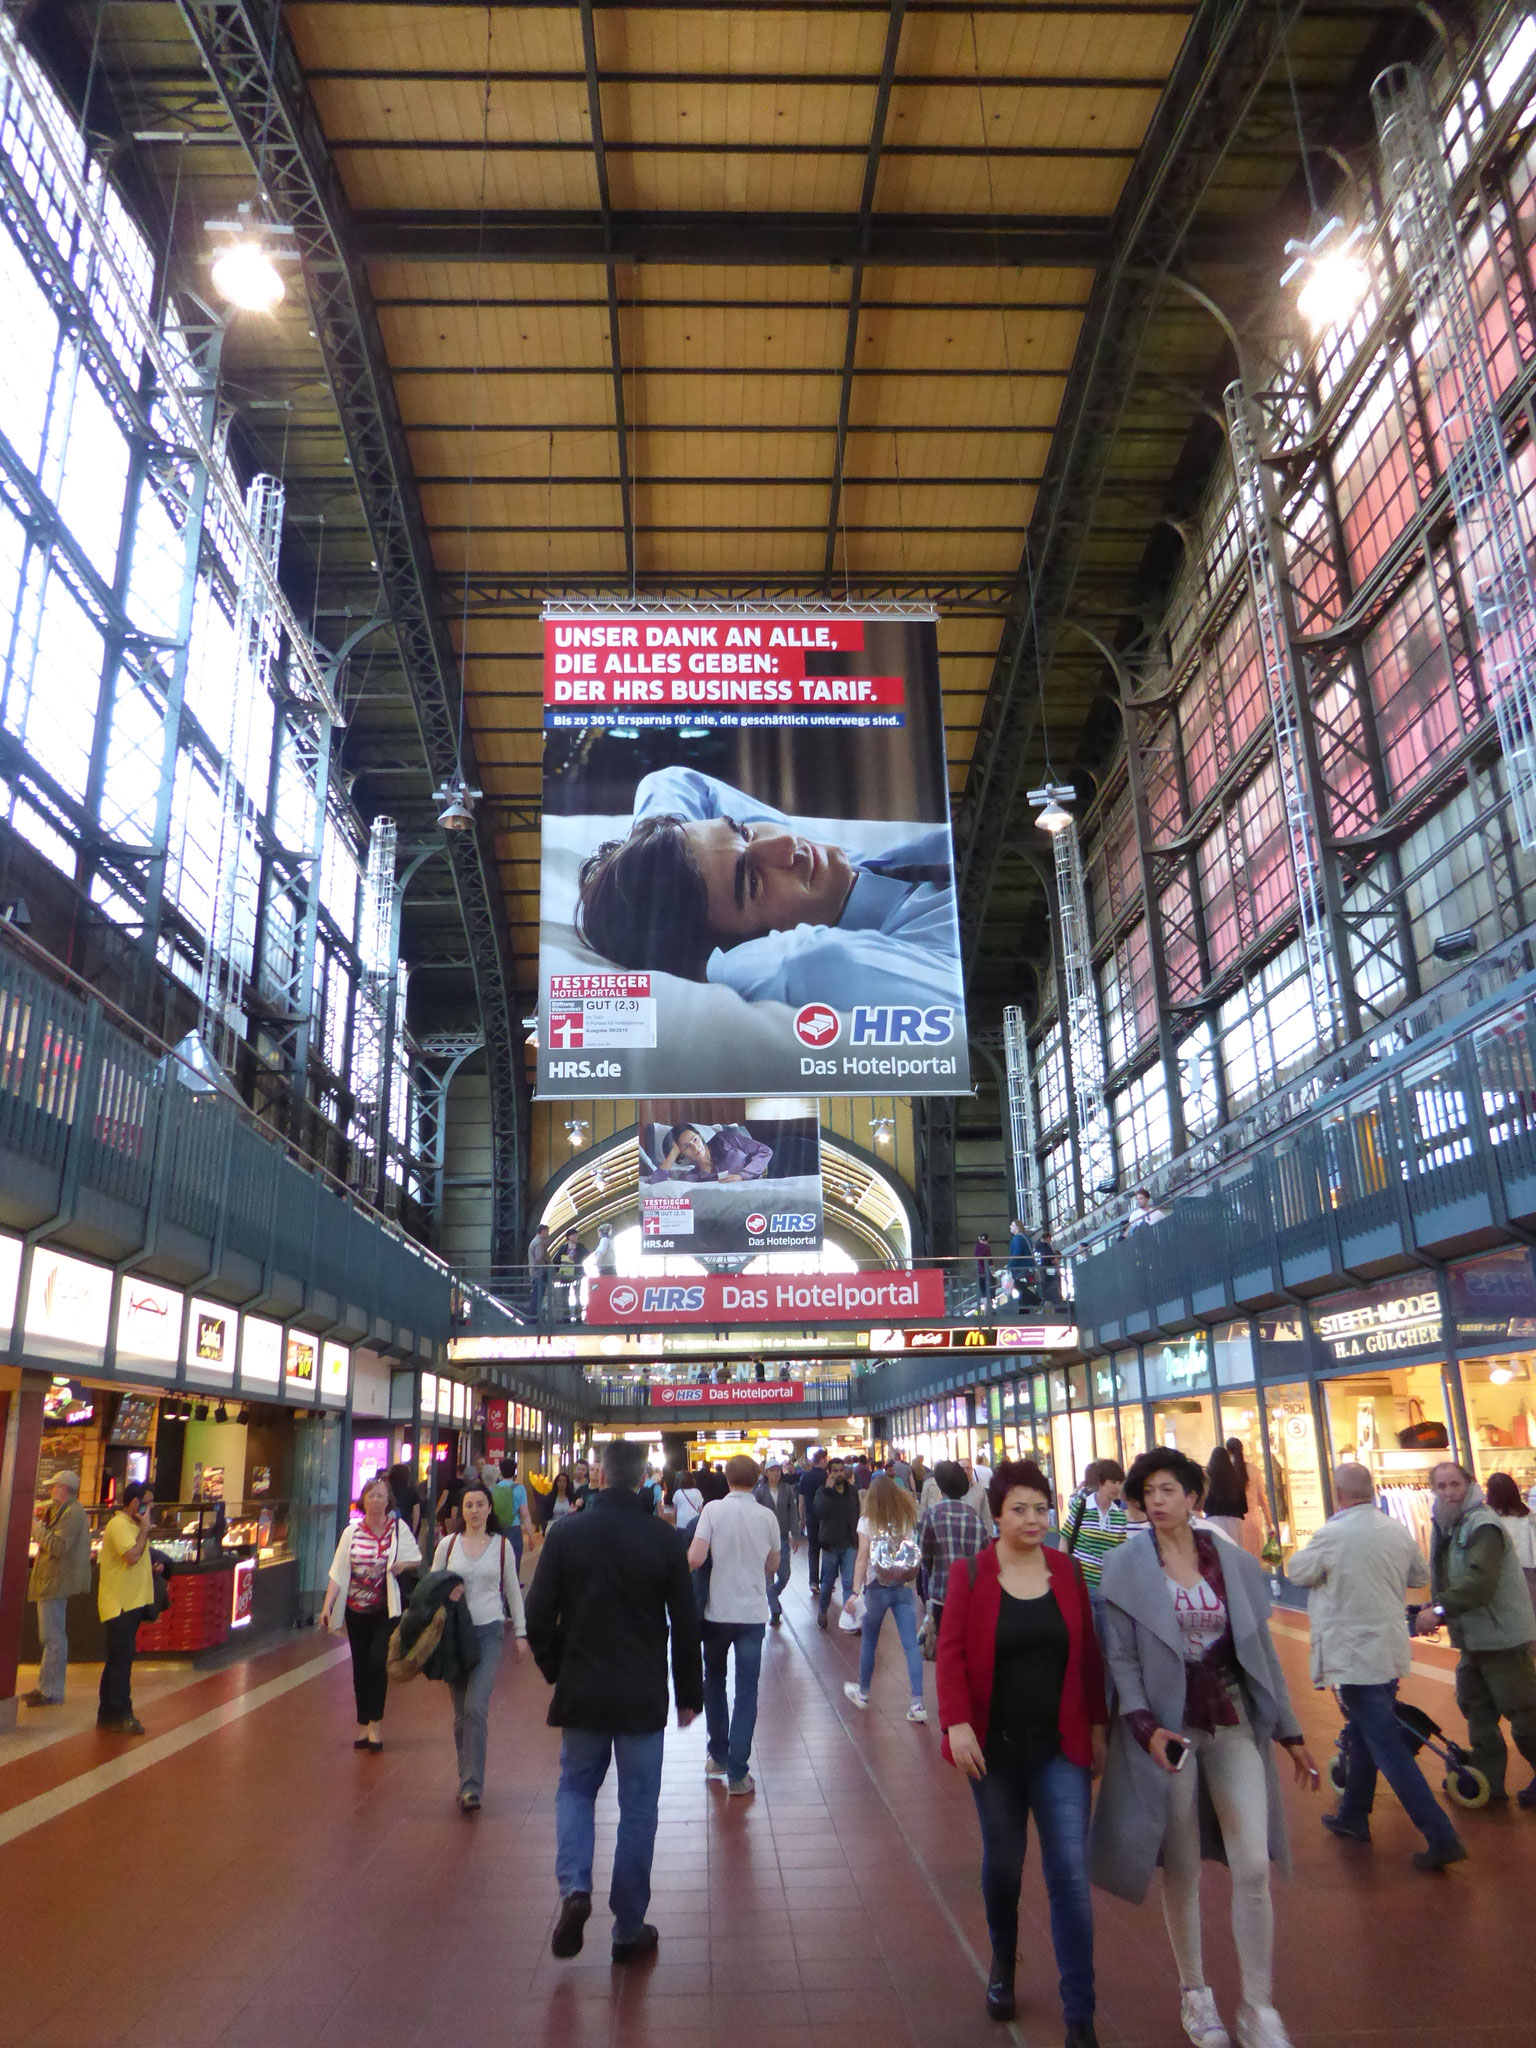 Innenhalle des Hamburger Hauptbahnhofs